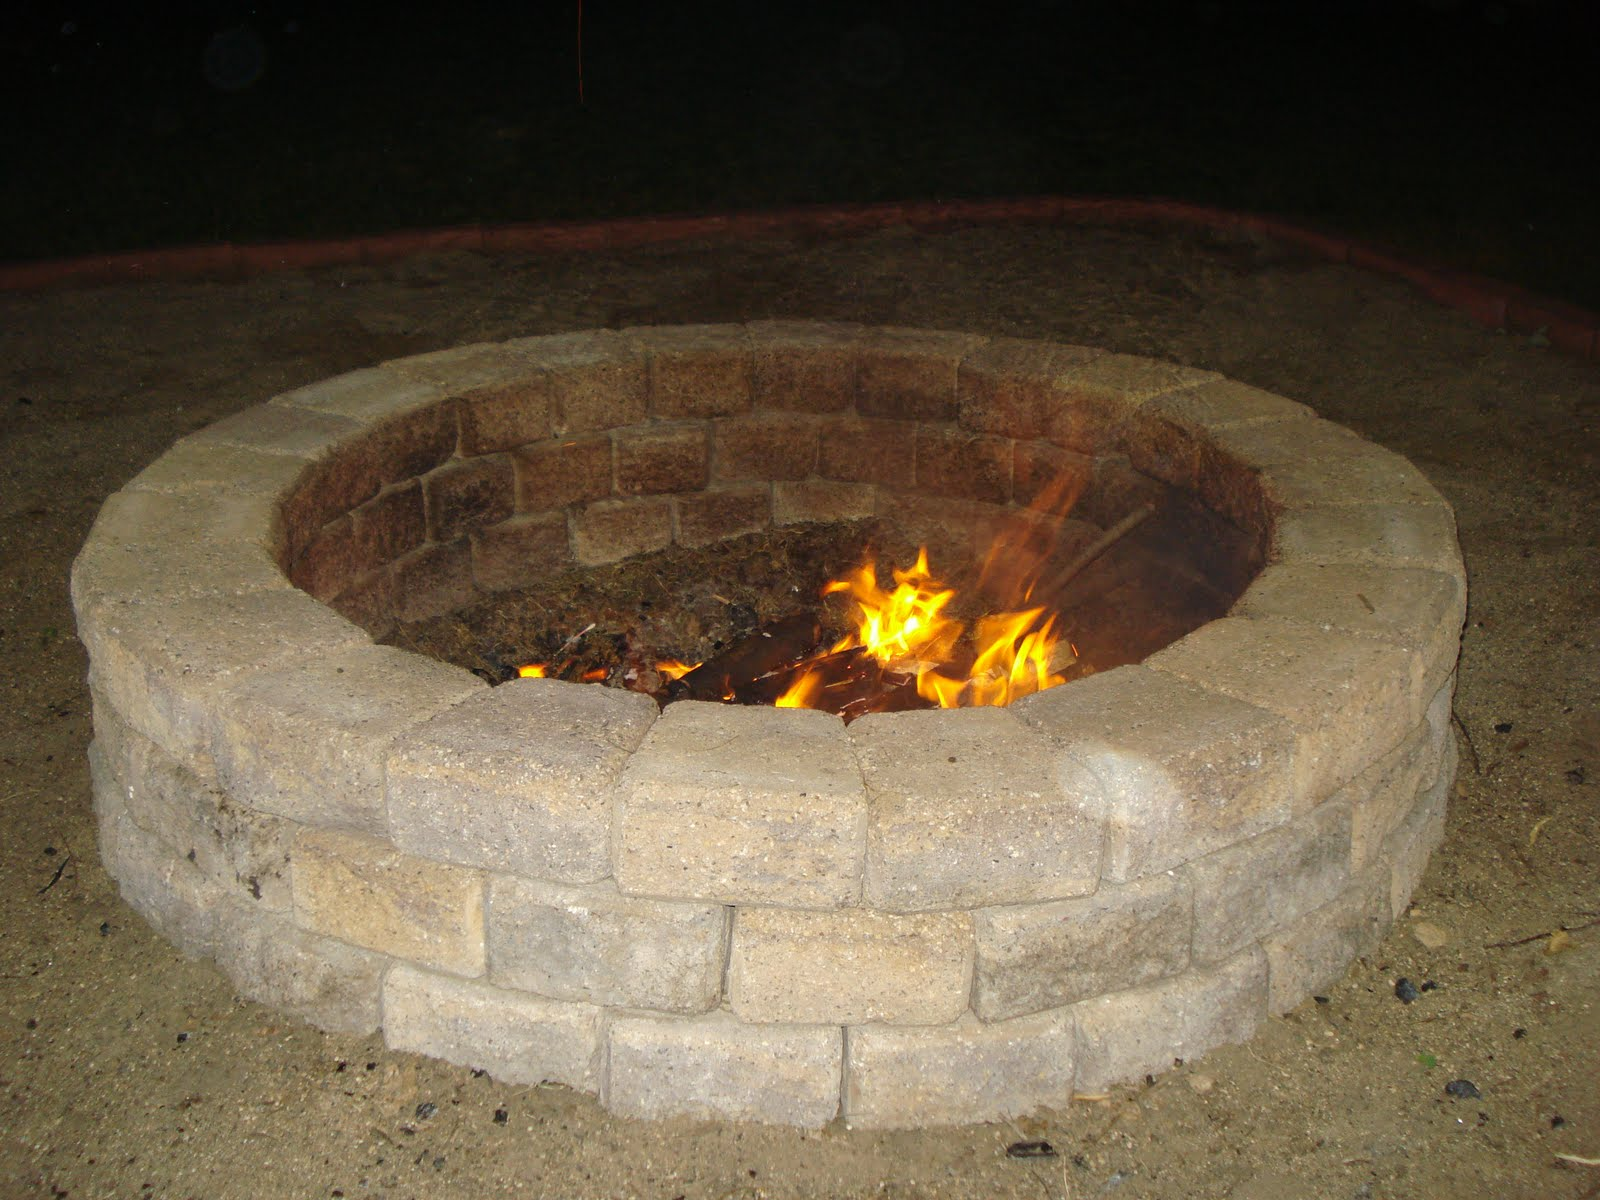 d and b backyard fire pit. Black Bedroom Furniture Sets. Home Design Ideas